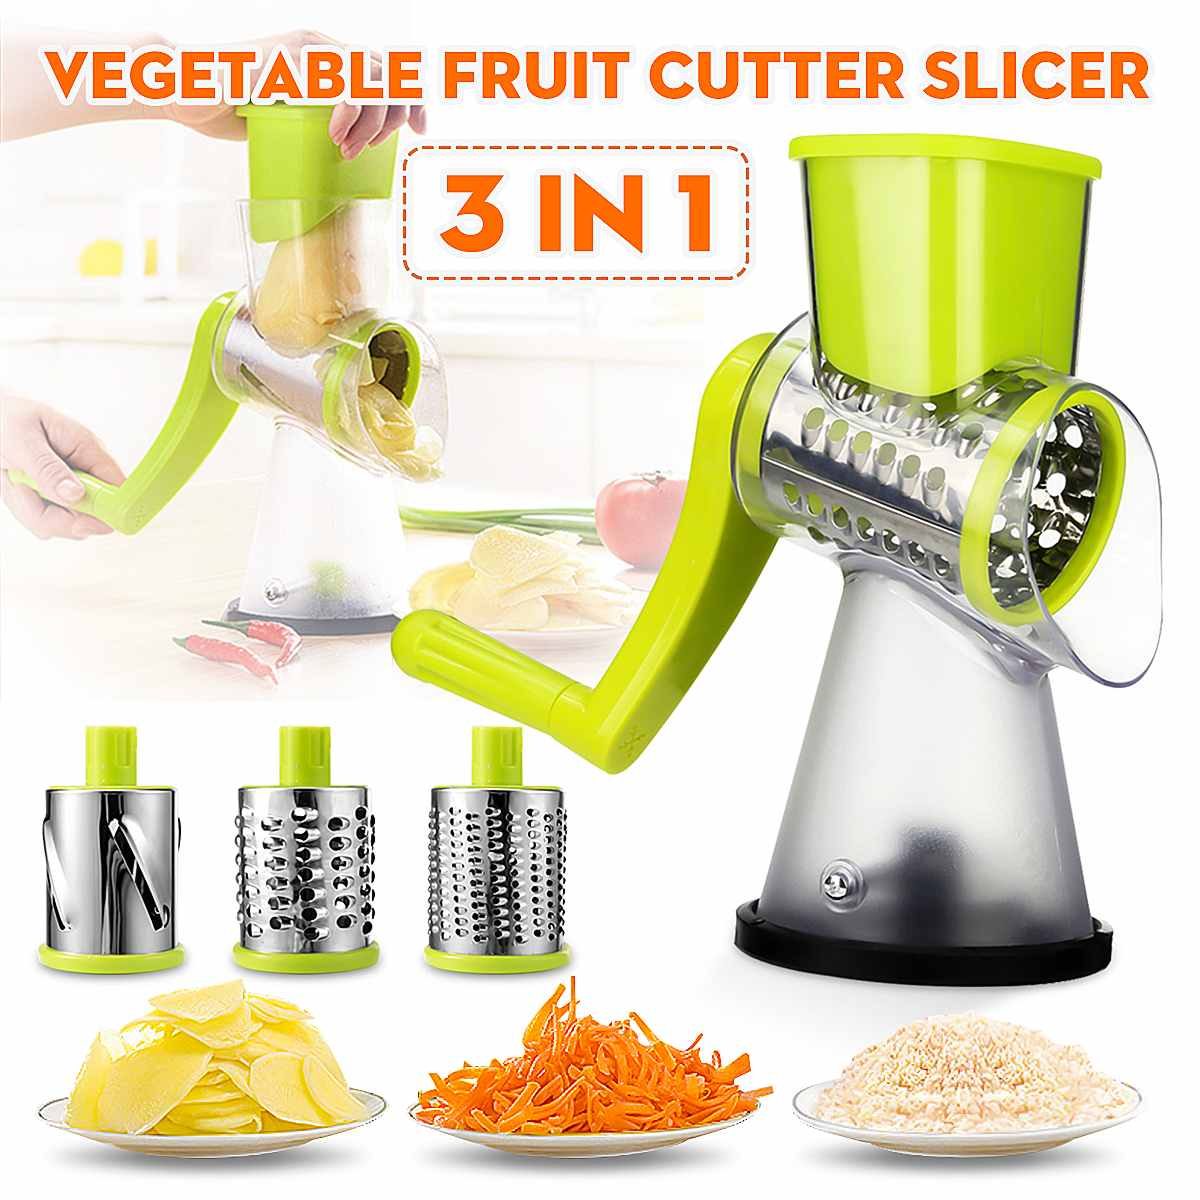 Cortadora cortadora Manual de verduras cortadora de papas rallador de zanahoria desmontable 3 hoja de acero inoxidable molinillo de carne Base antideslizante